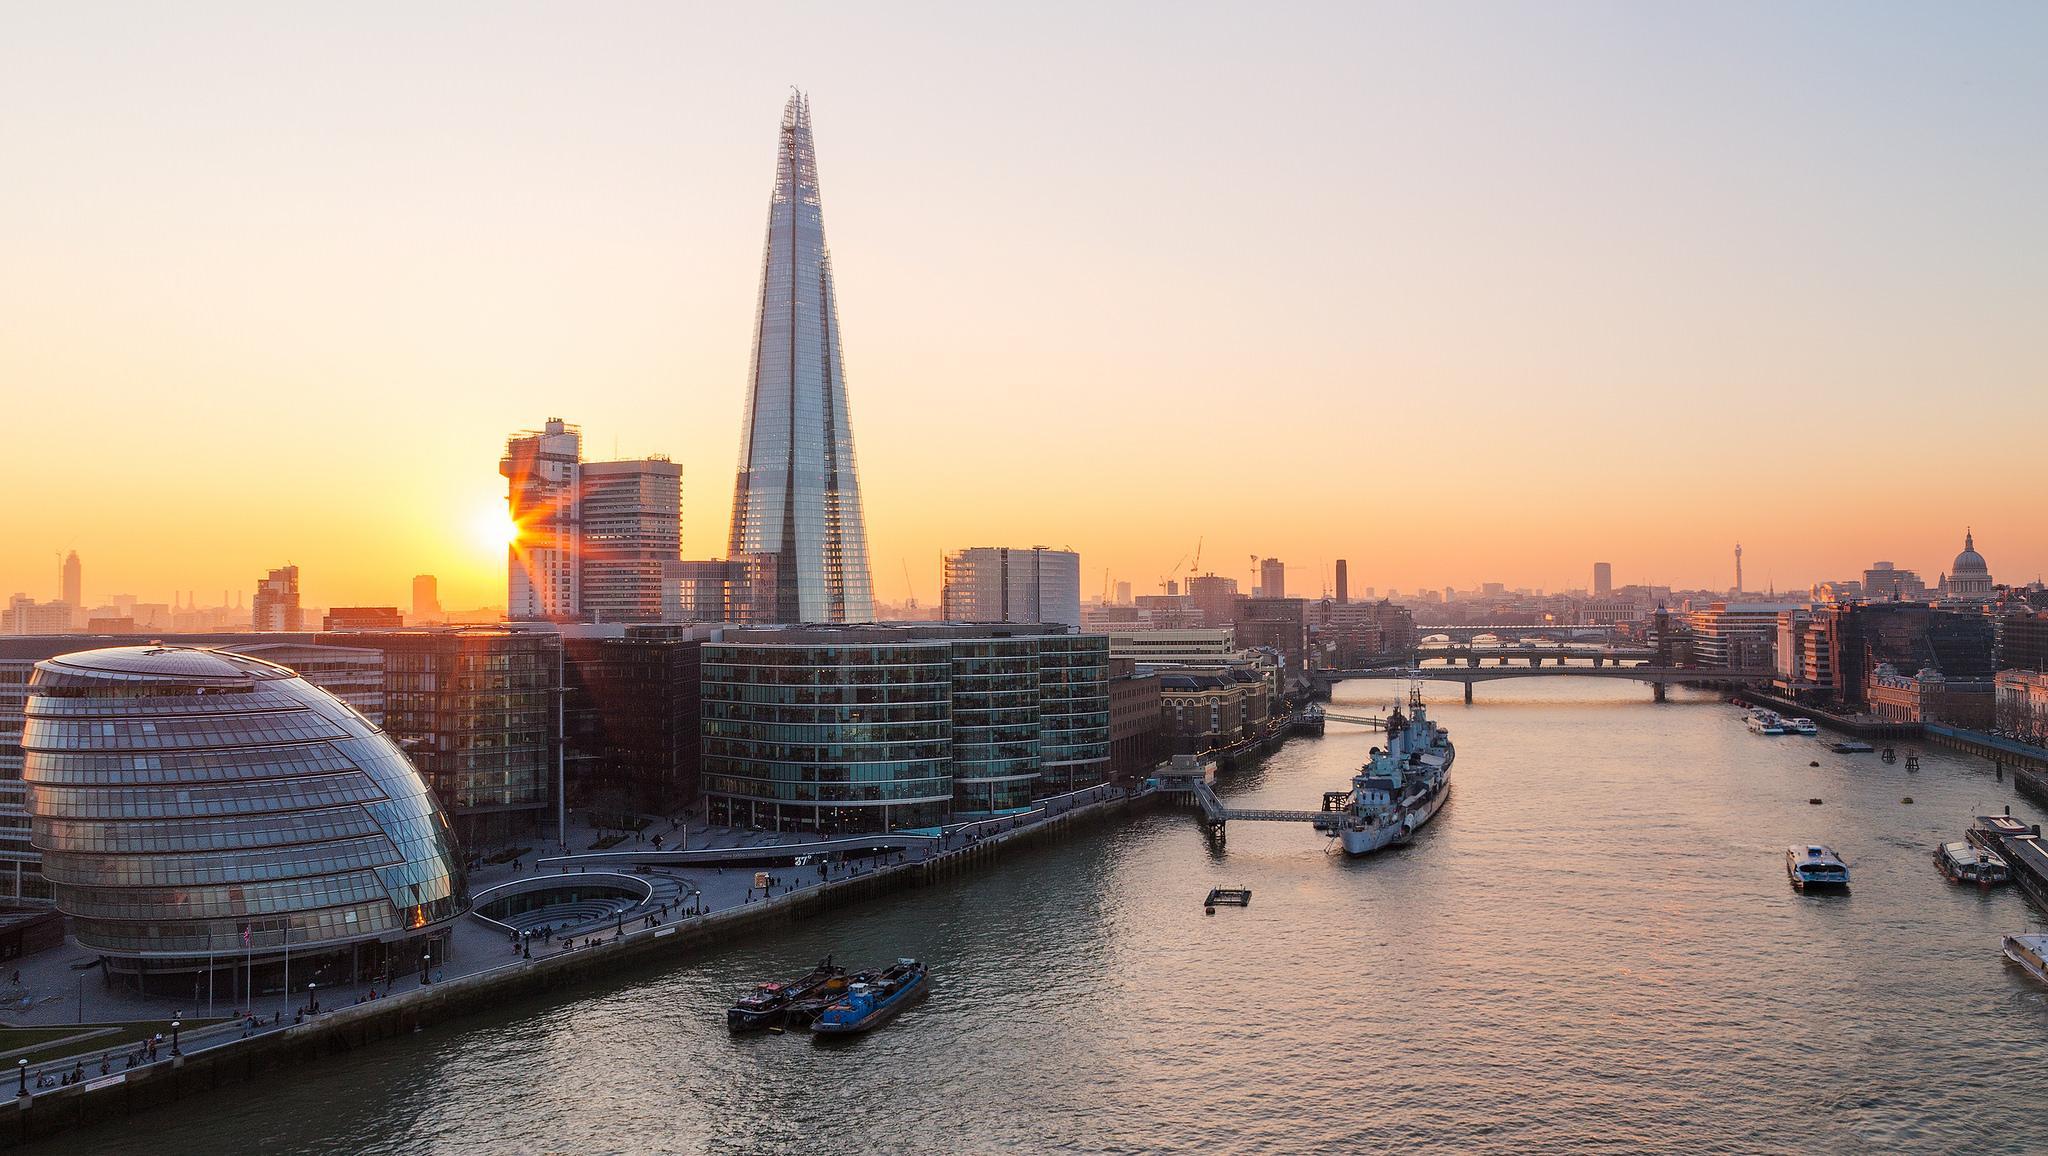 обои River Thames, London, Великобритания, Лондон картинки фото